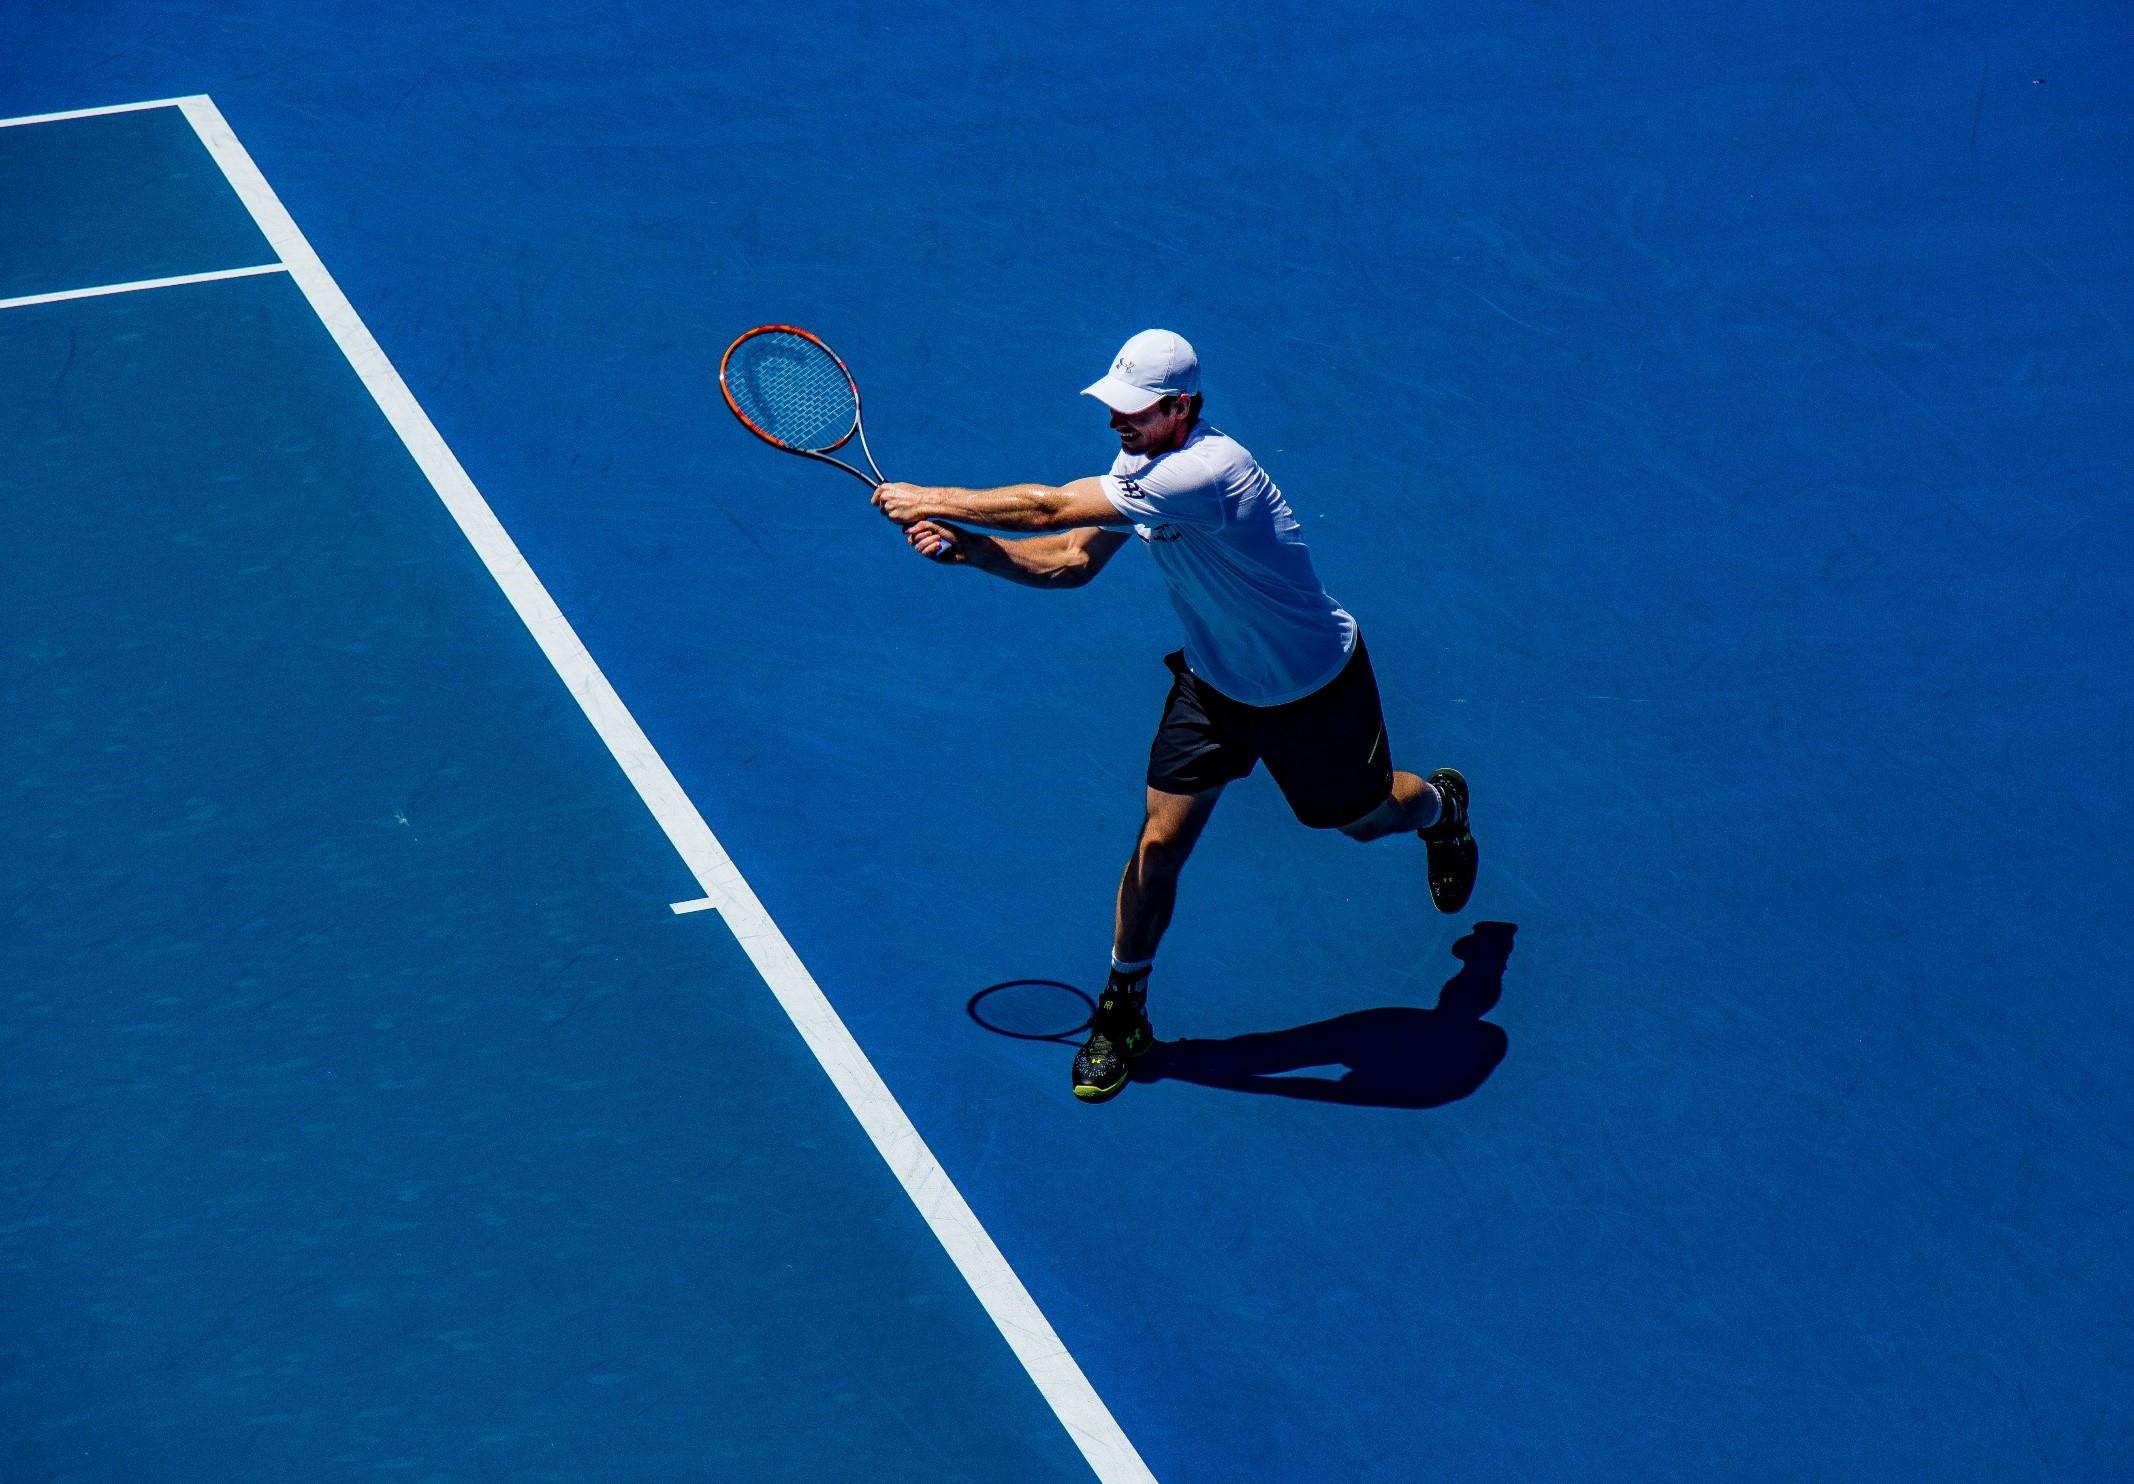 Andy Murray - an Under Armour brand ambassador